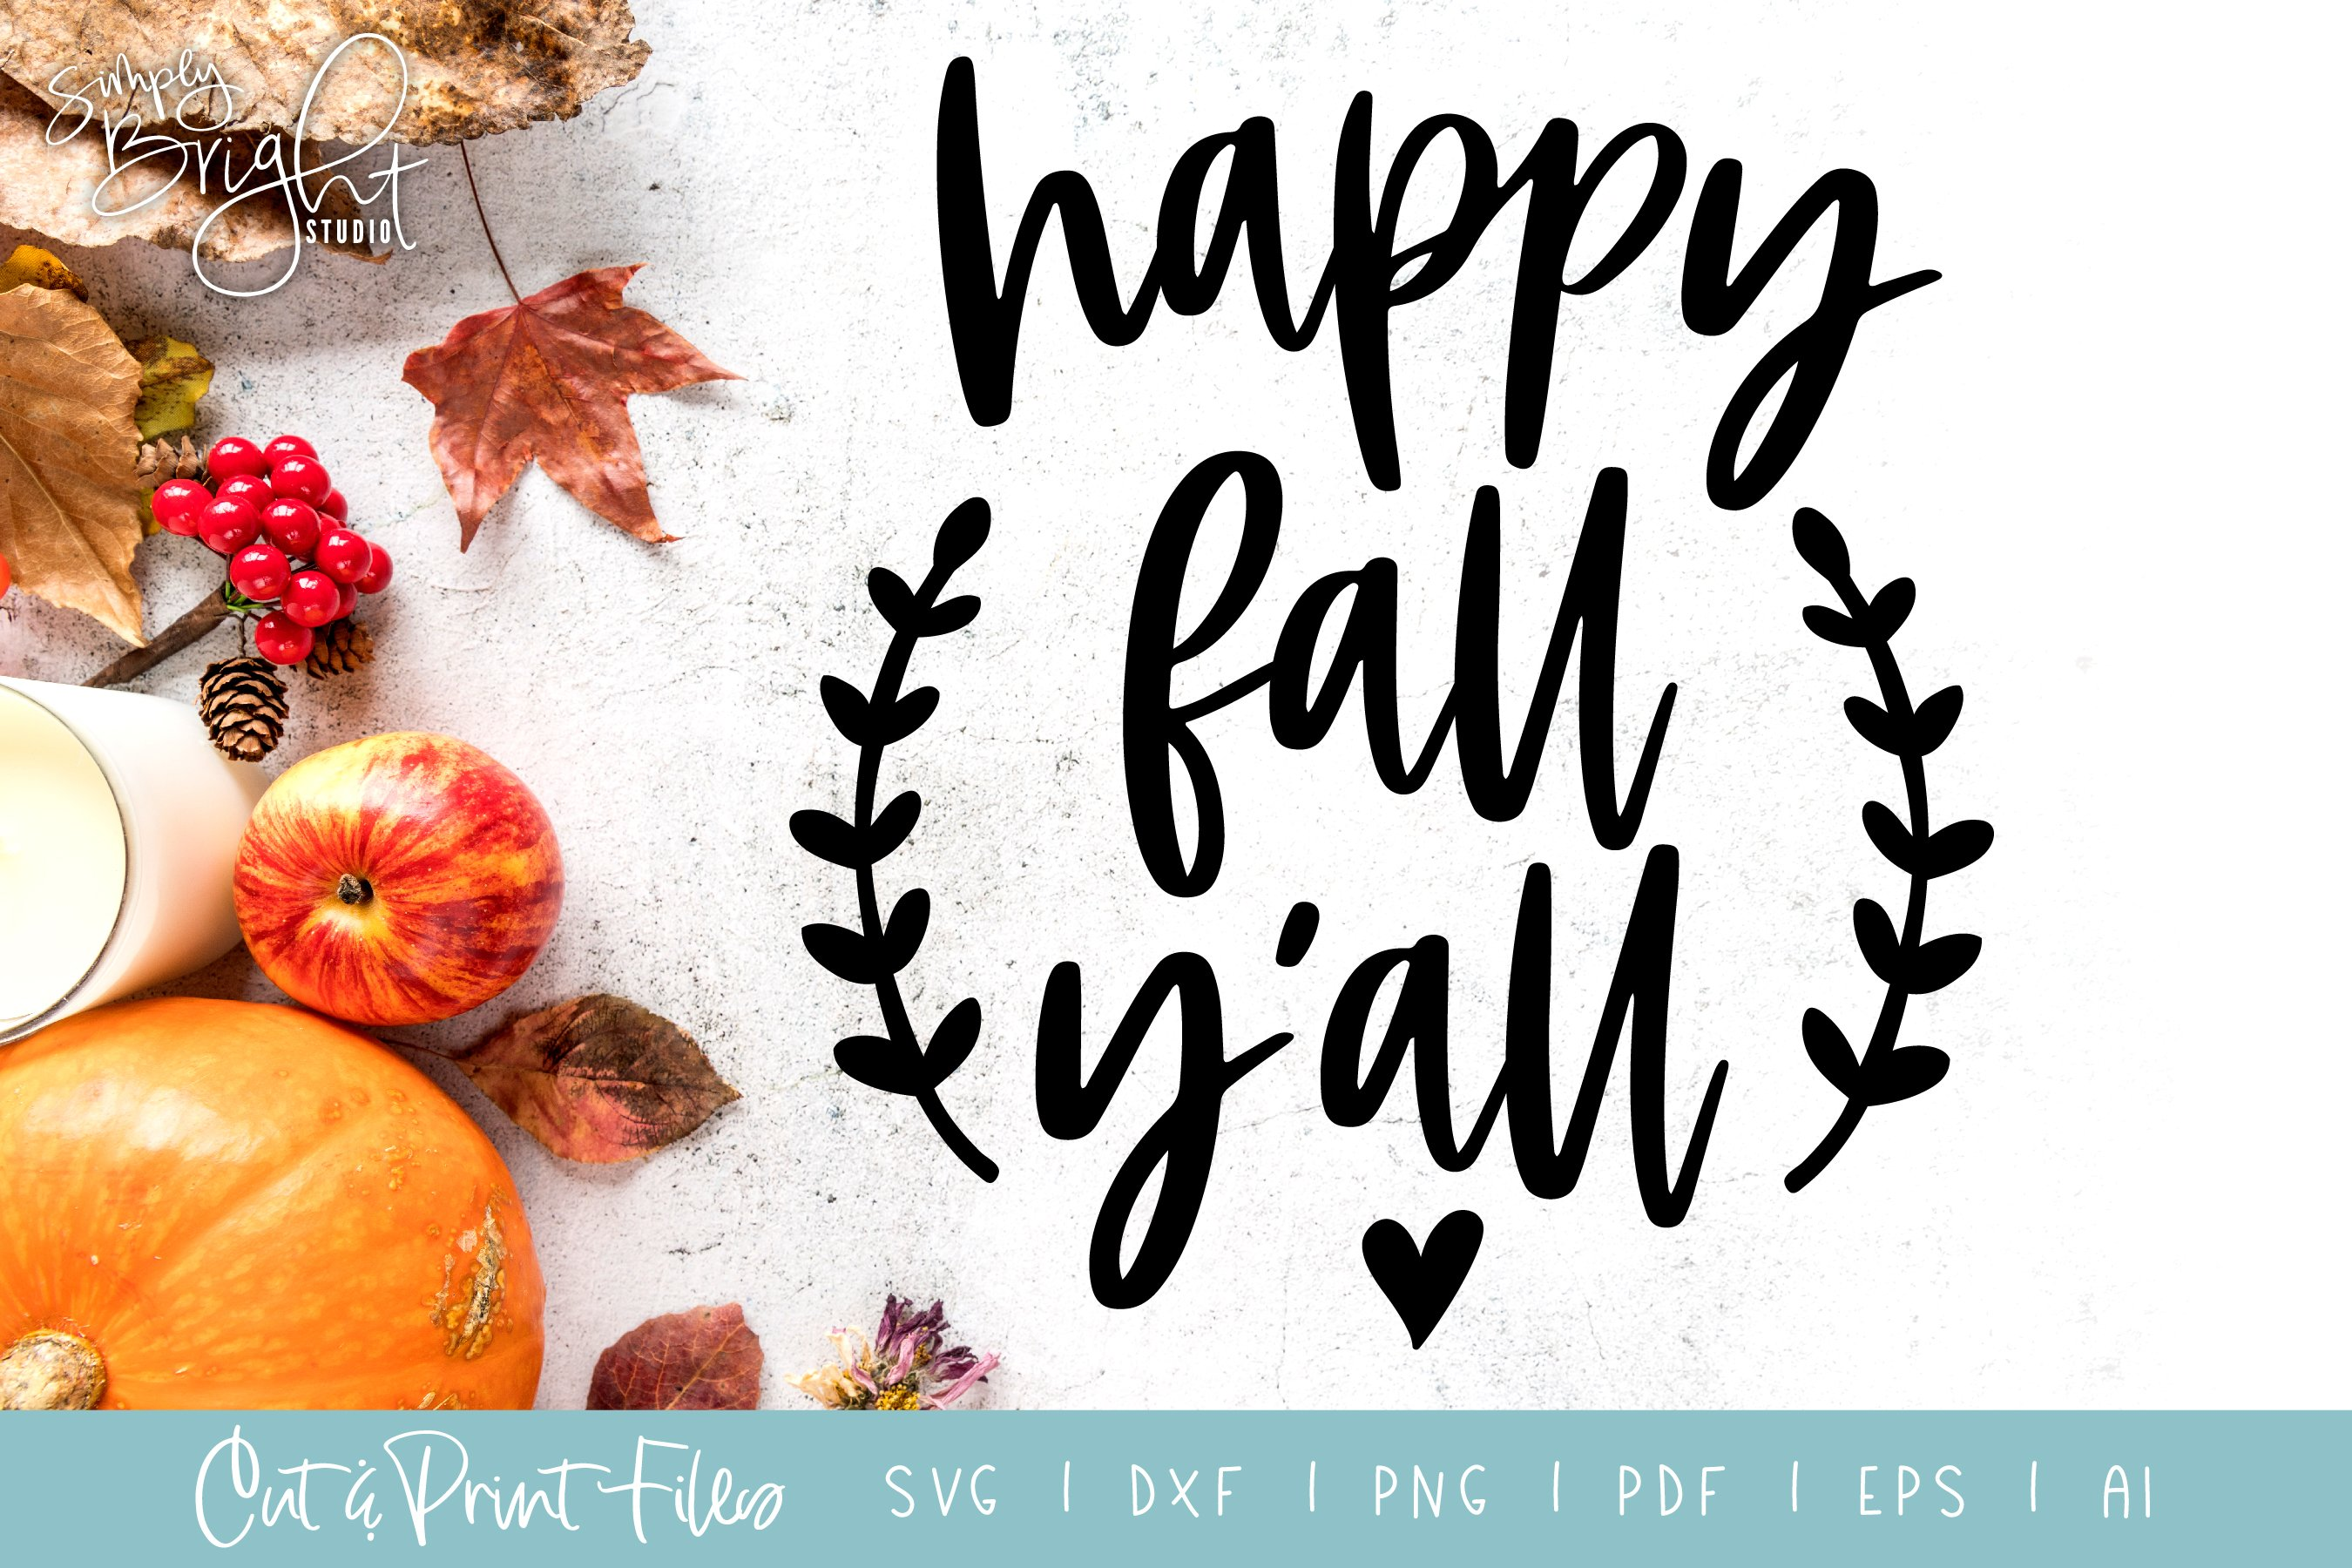 Happy Fall Yall Cut Print Files Pre Designed Photoshop Graphics Creative Market